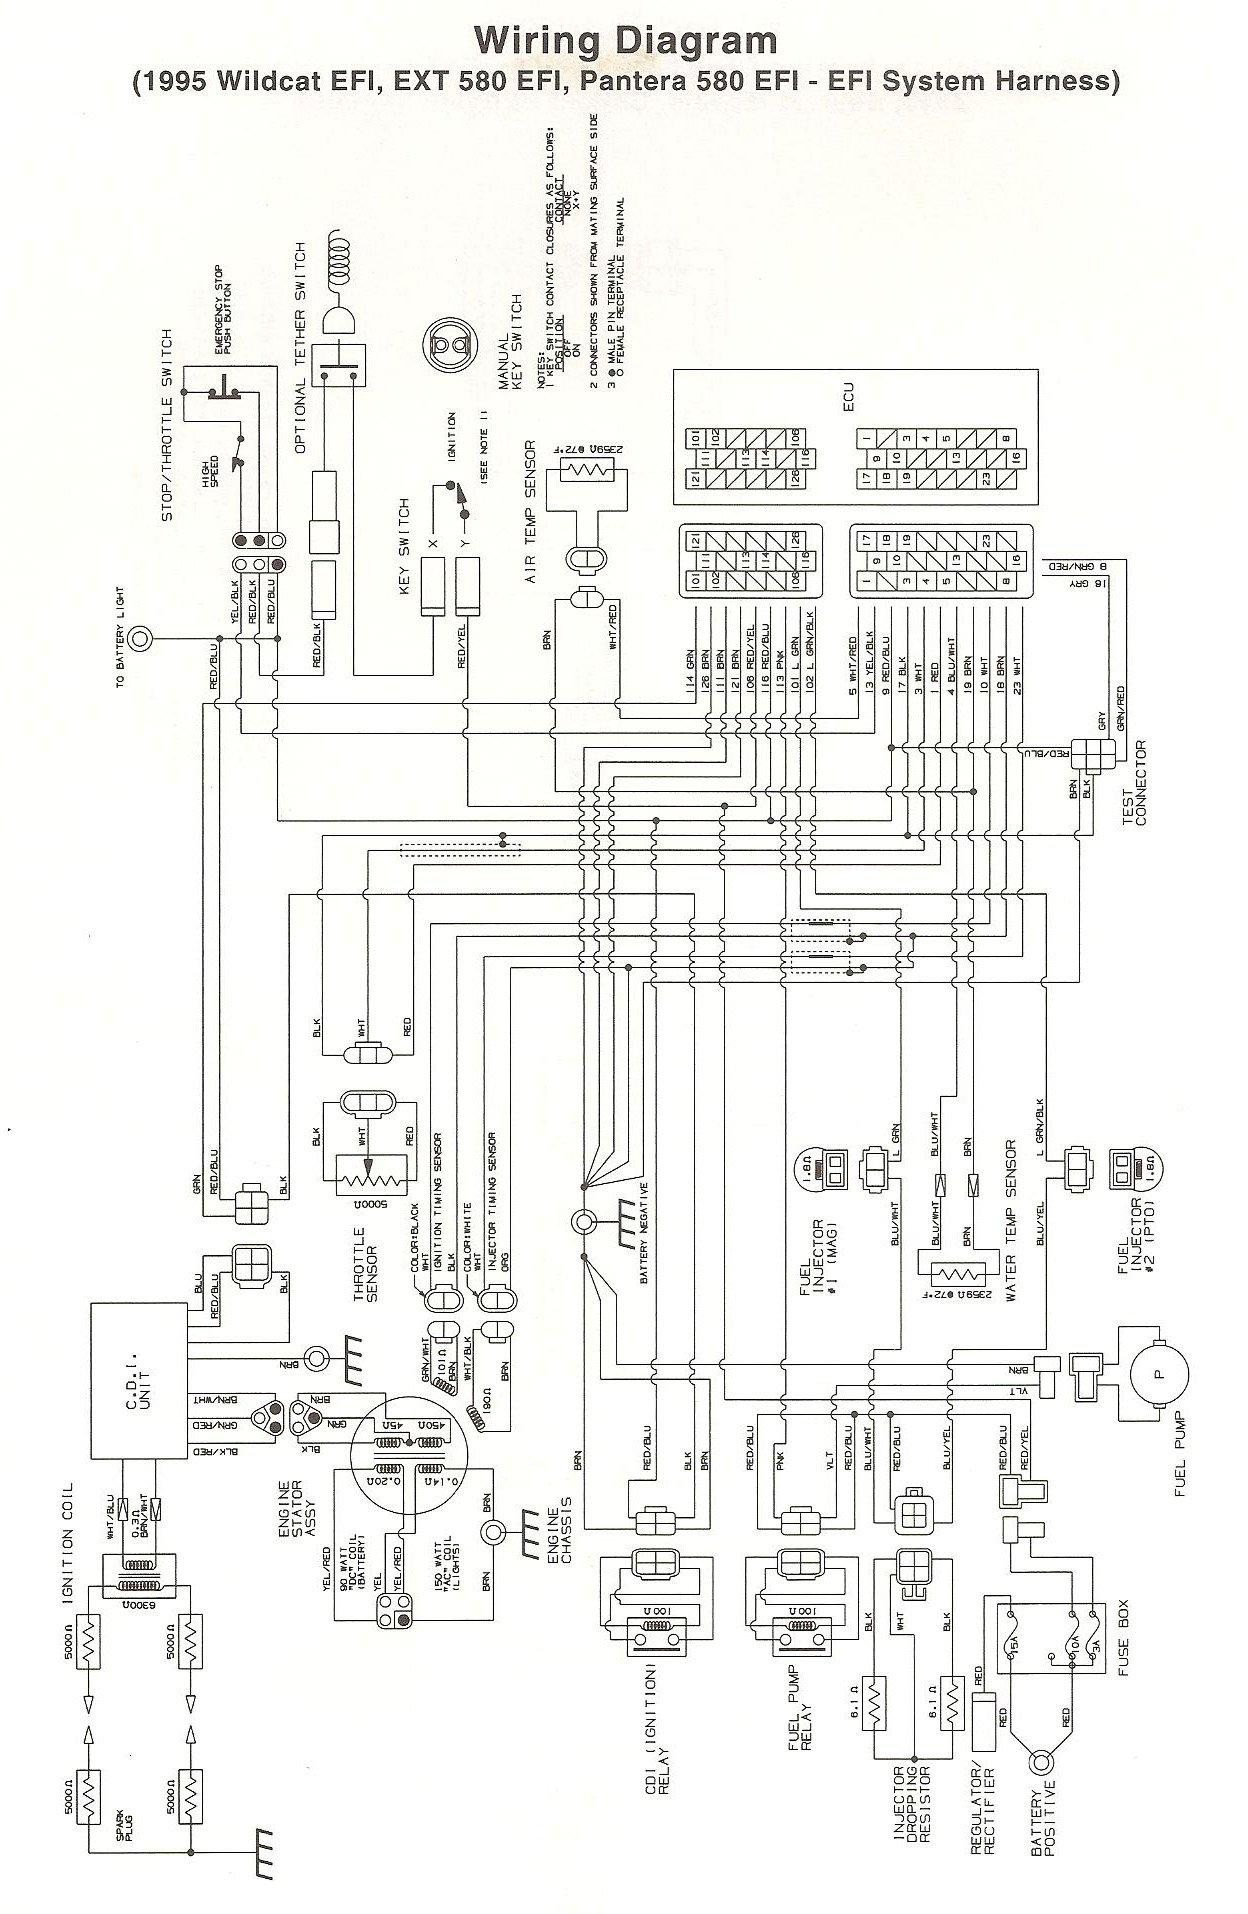 hight resolution of 2012 arctic cat 425 starter wiring diagram wiring diagram source 2011 arctic cat prowler 700 manual zrt wiring diagram in addition arctic cat